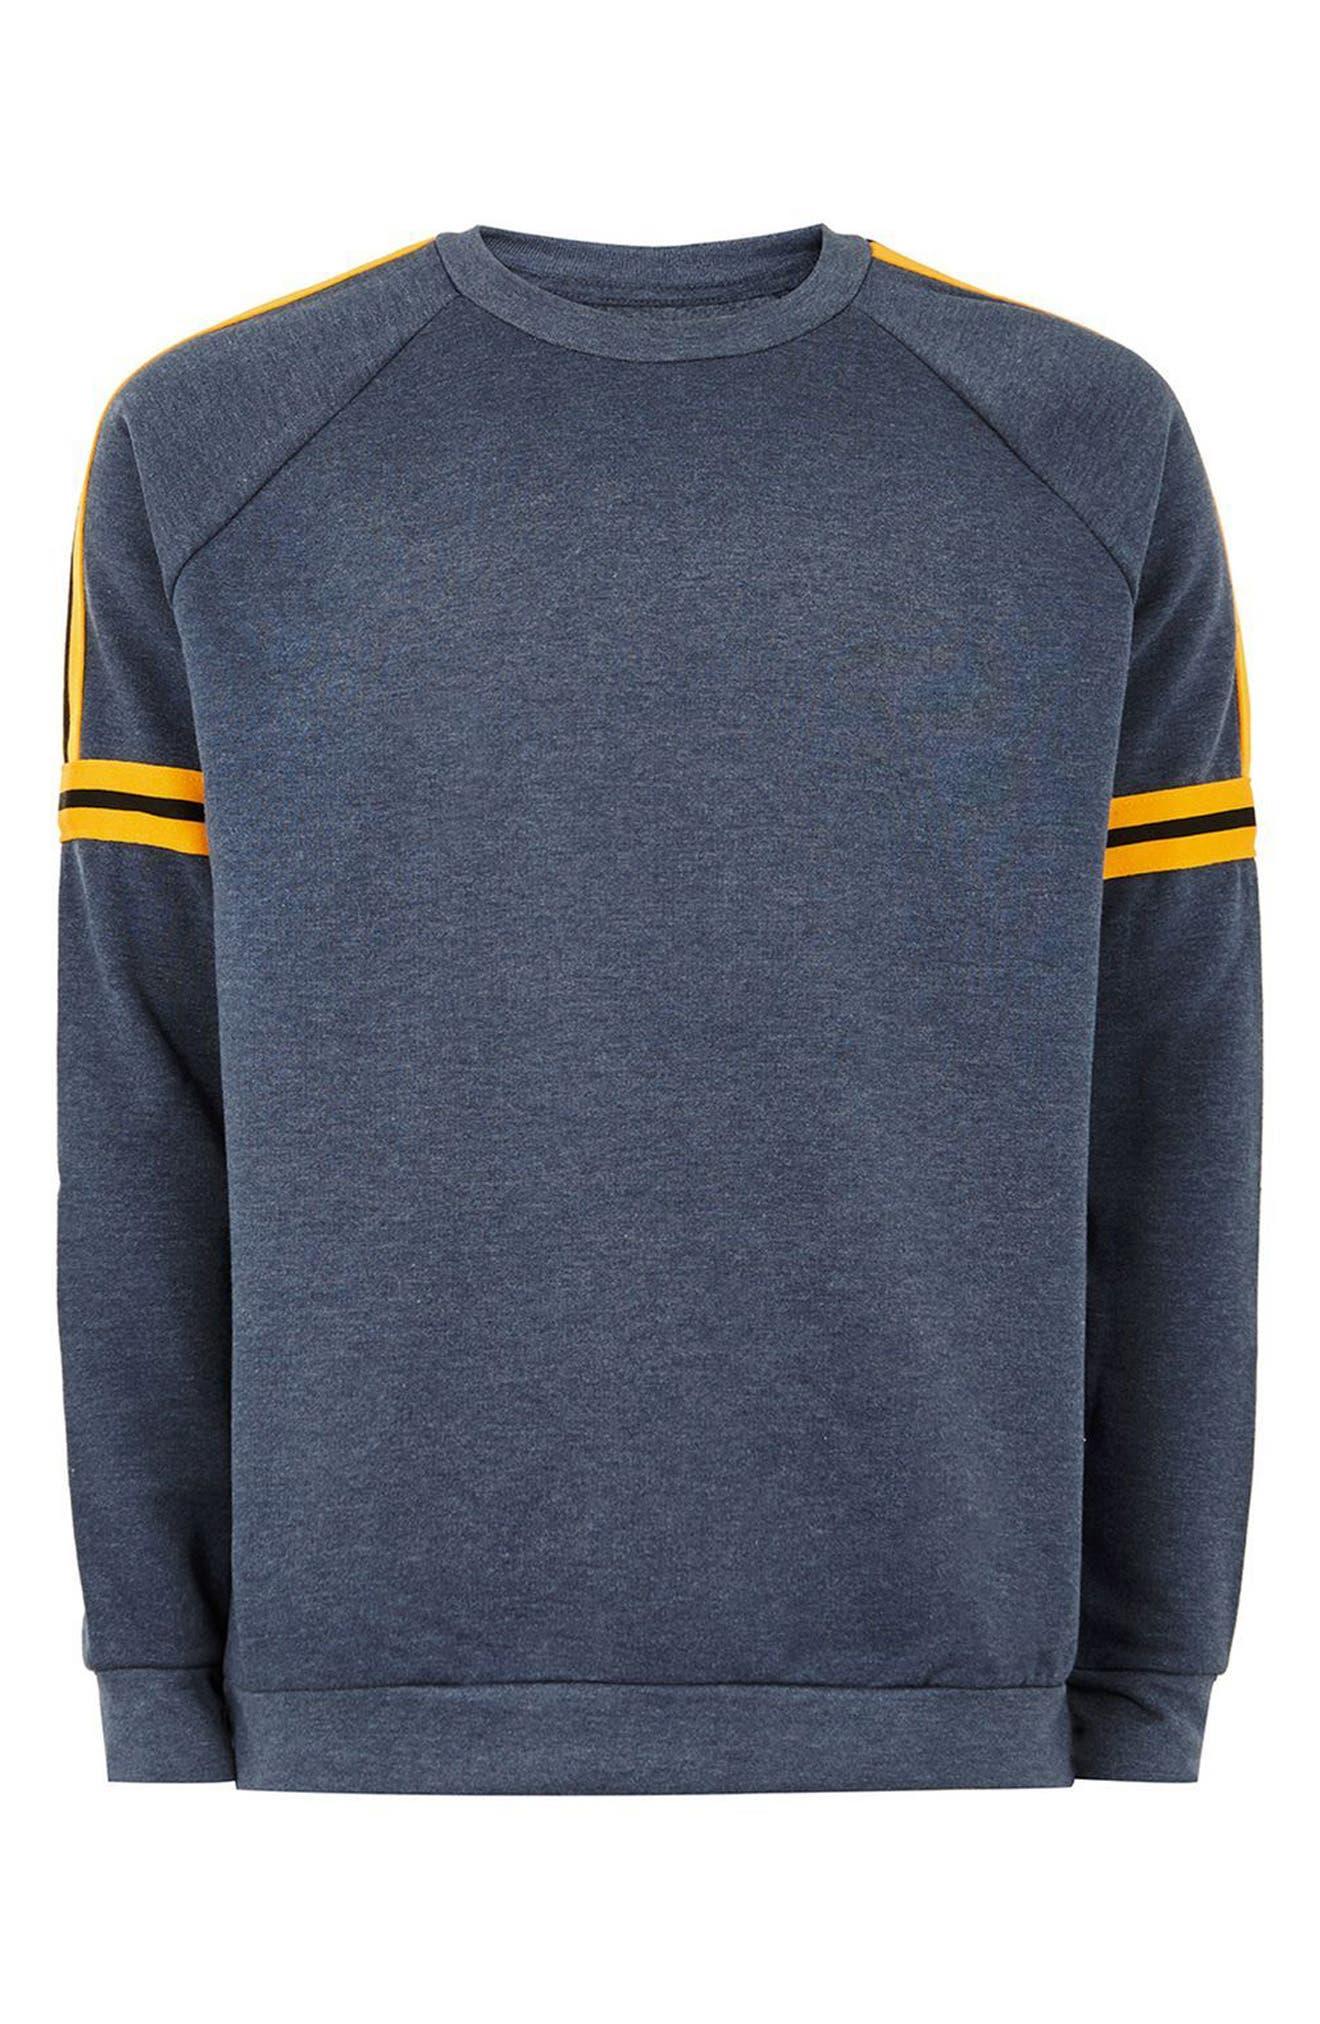 Tape Crewneck Sweatshirt,                             Alternate thumbnail 4, color,                             Dark Blue